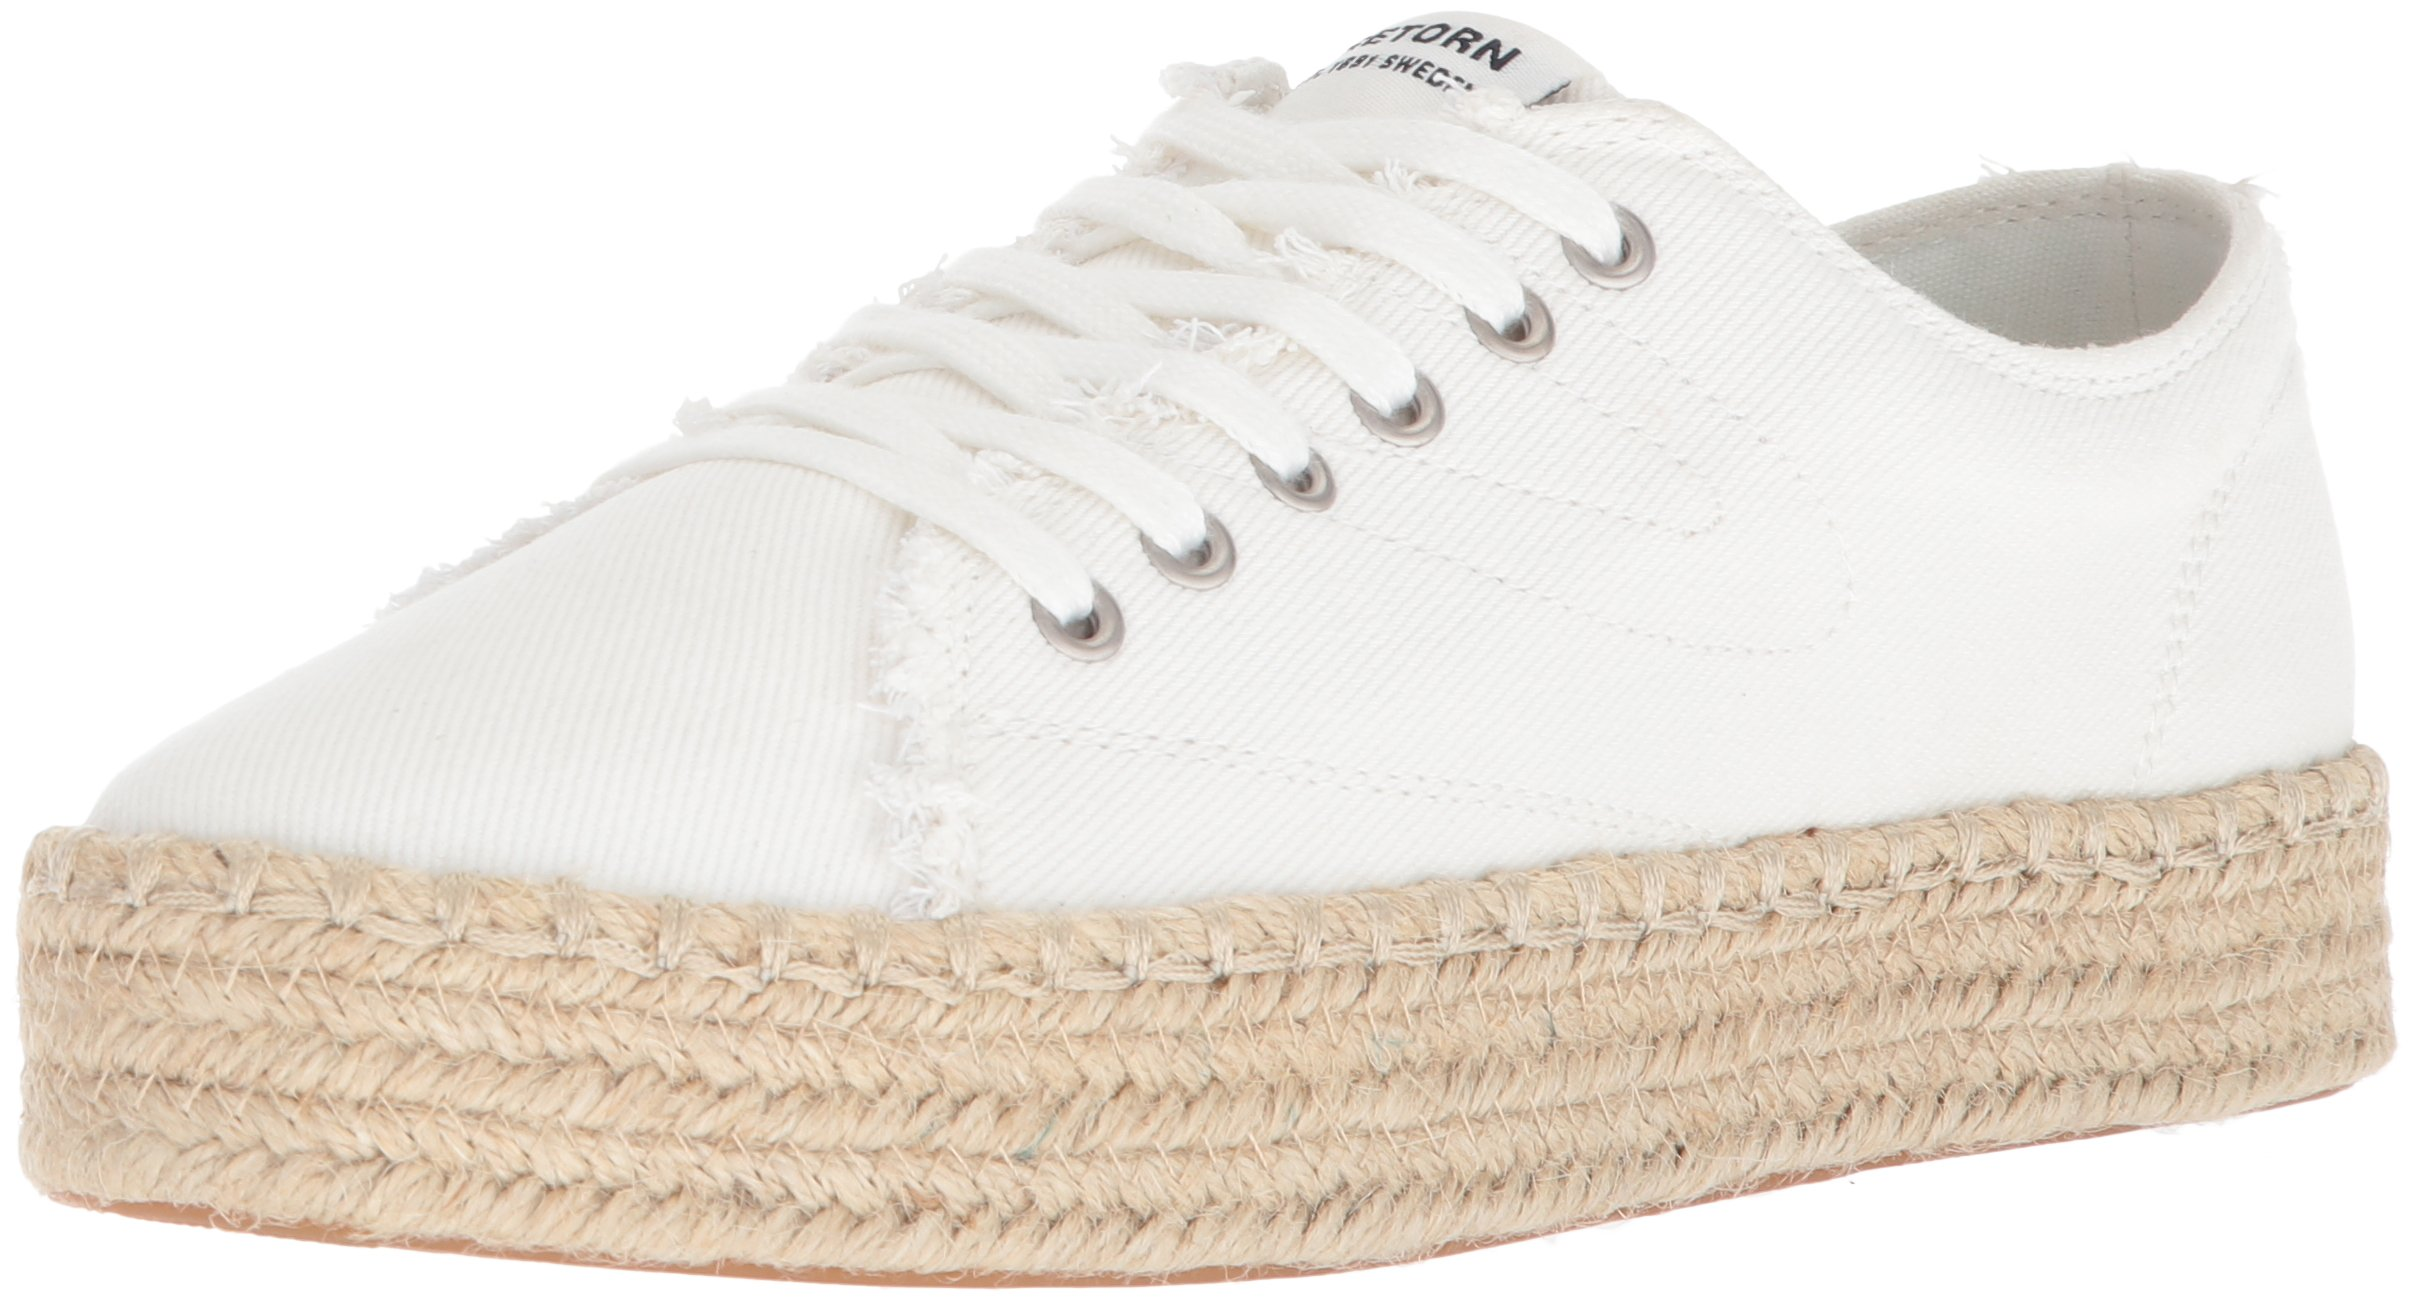 Tretorn Women's EVE Sneaker- Buy Online